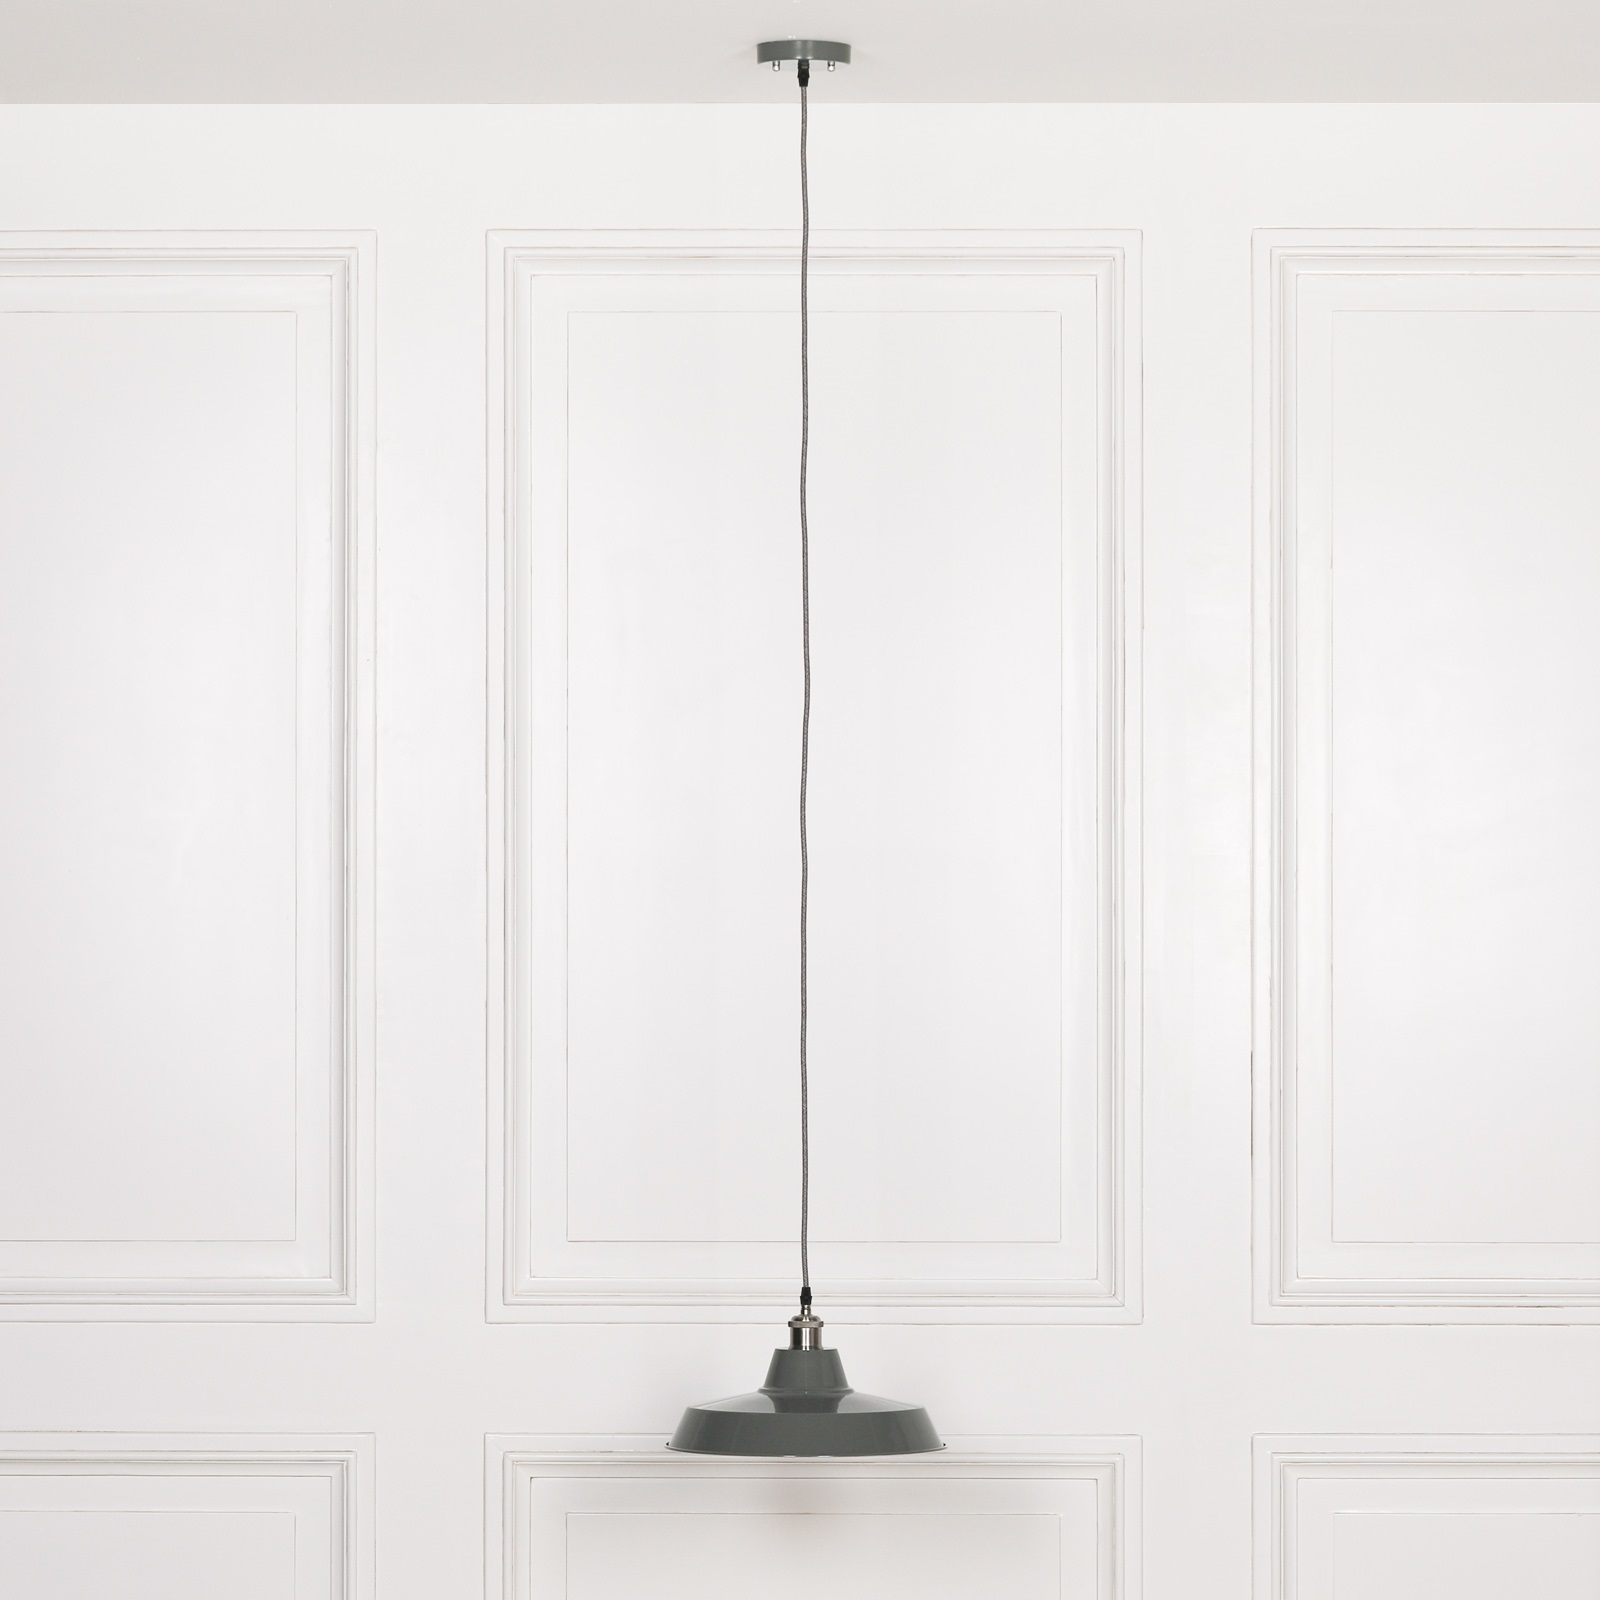 Factory Style Grey Enamel Painted 36cm Pendant Light